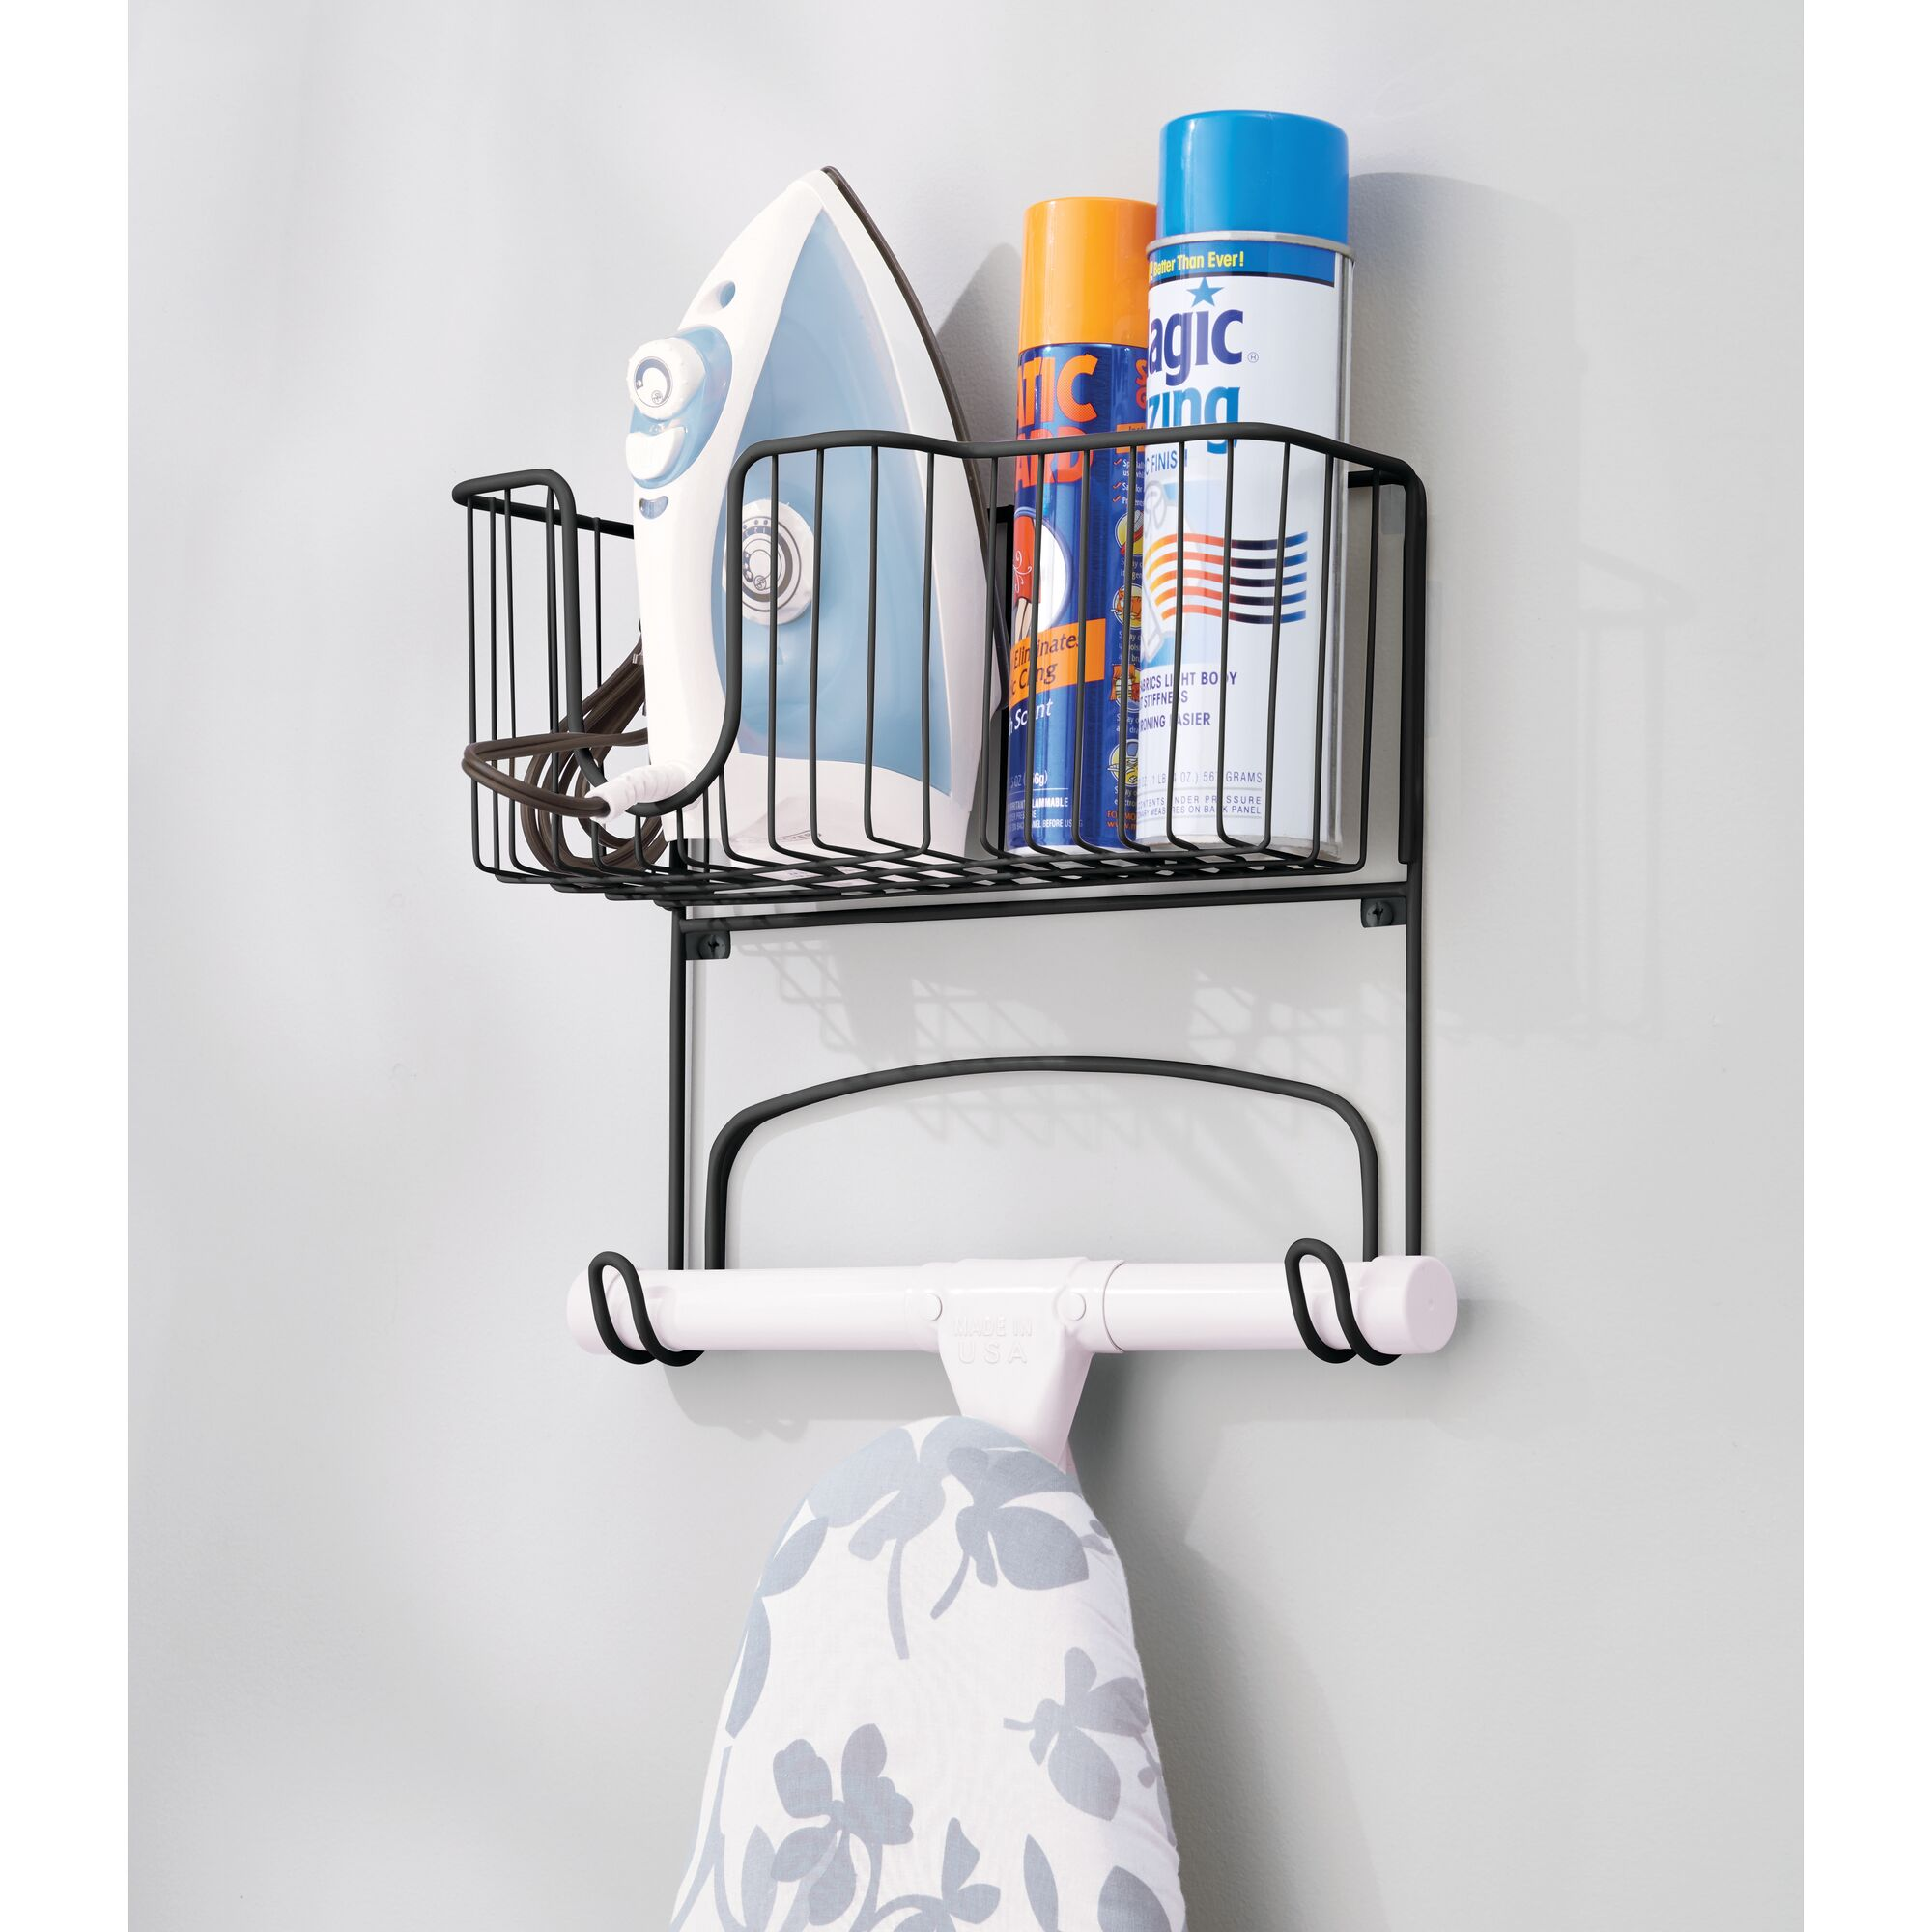 mDesign-Wall-Mount-Ironing-Board-Holder-Large-Storage-Basket thumbnail 39